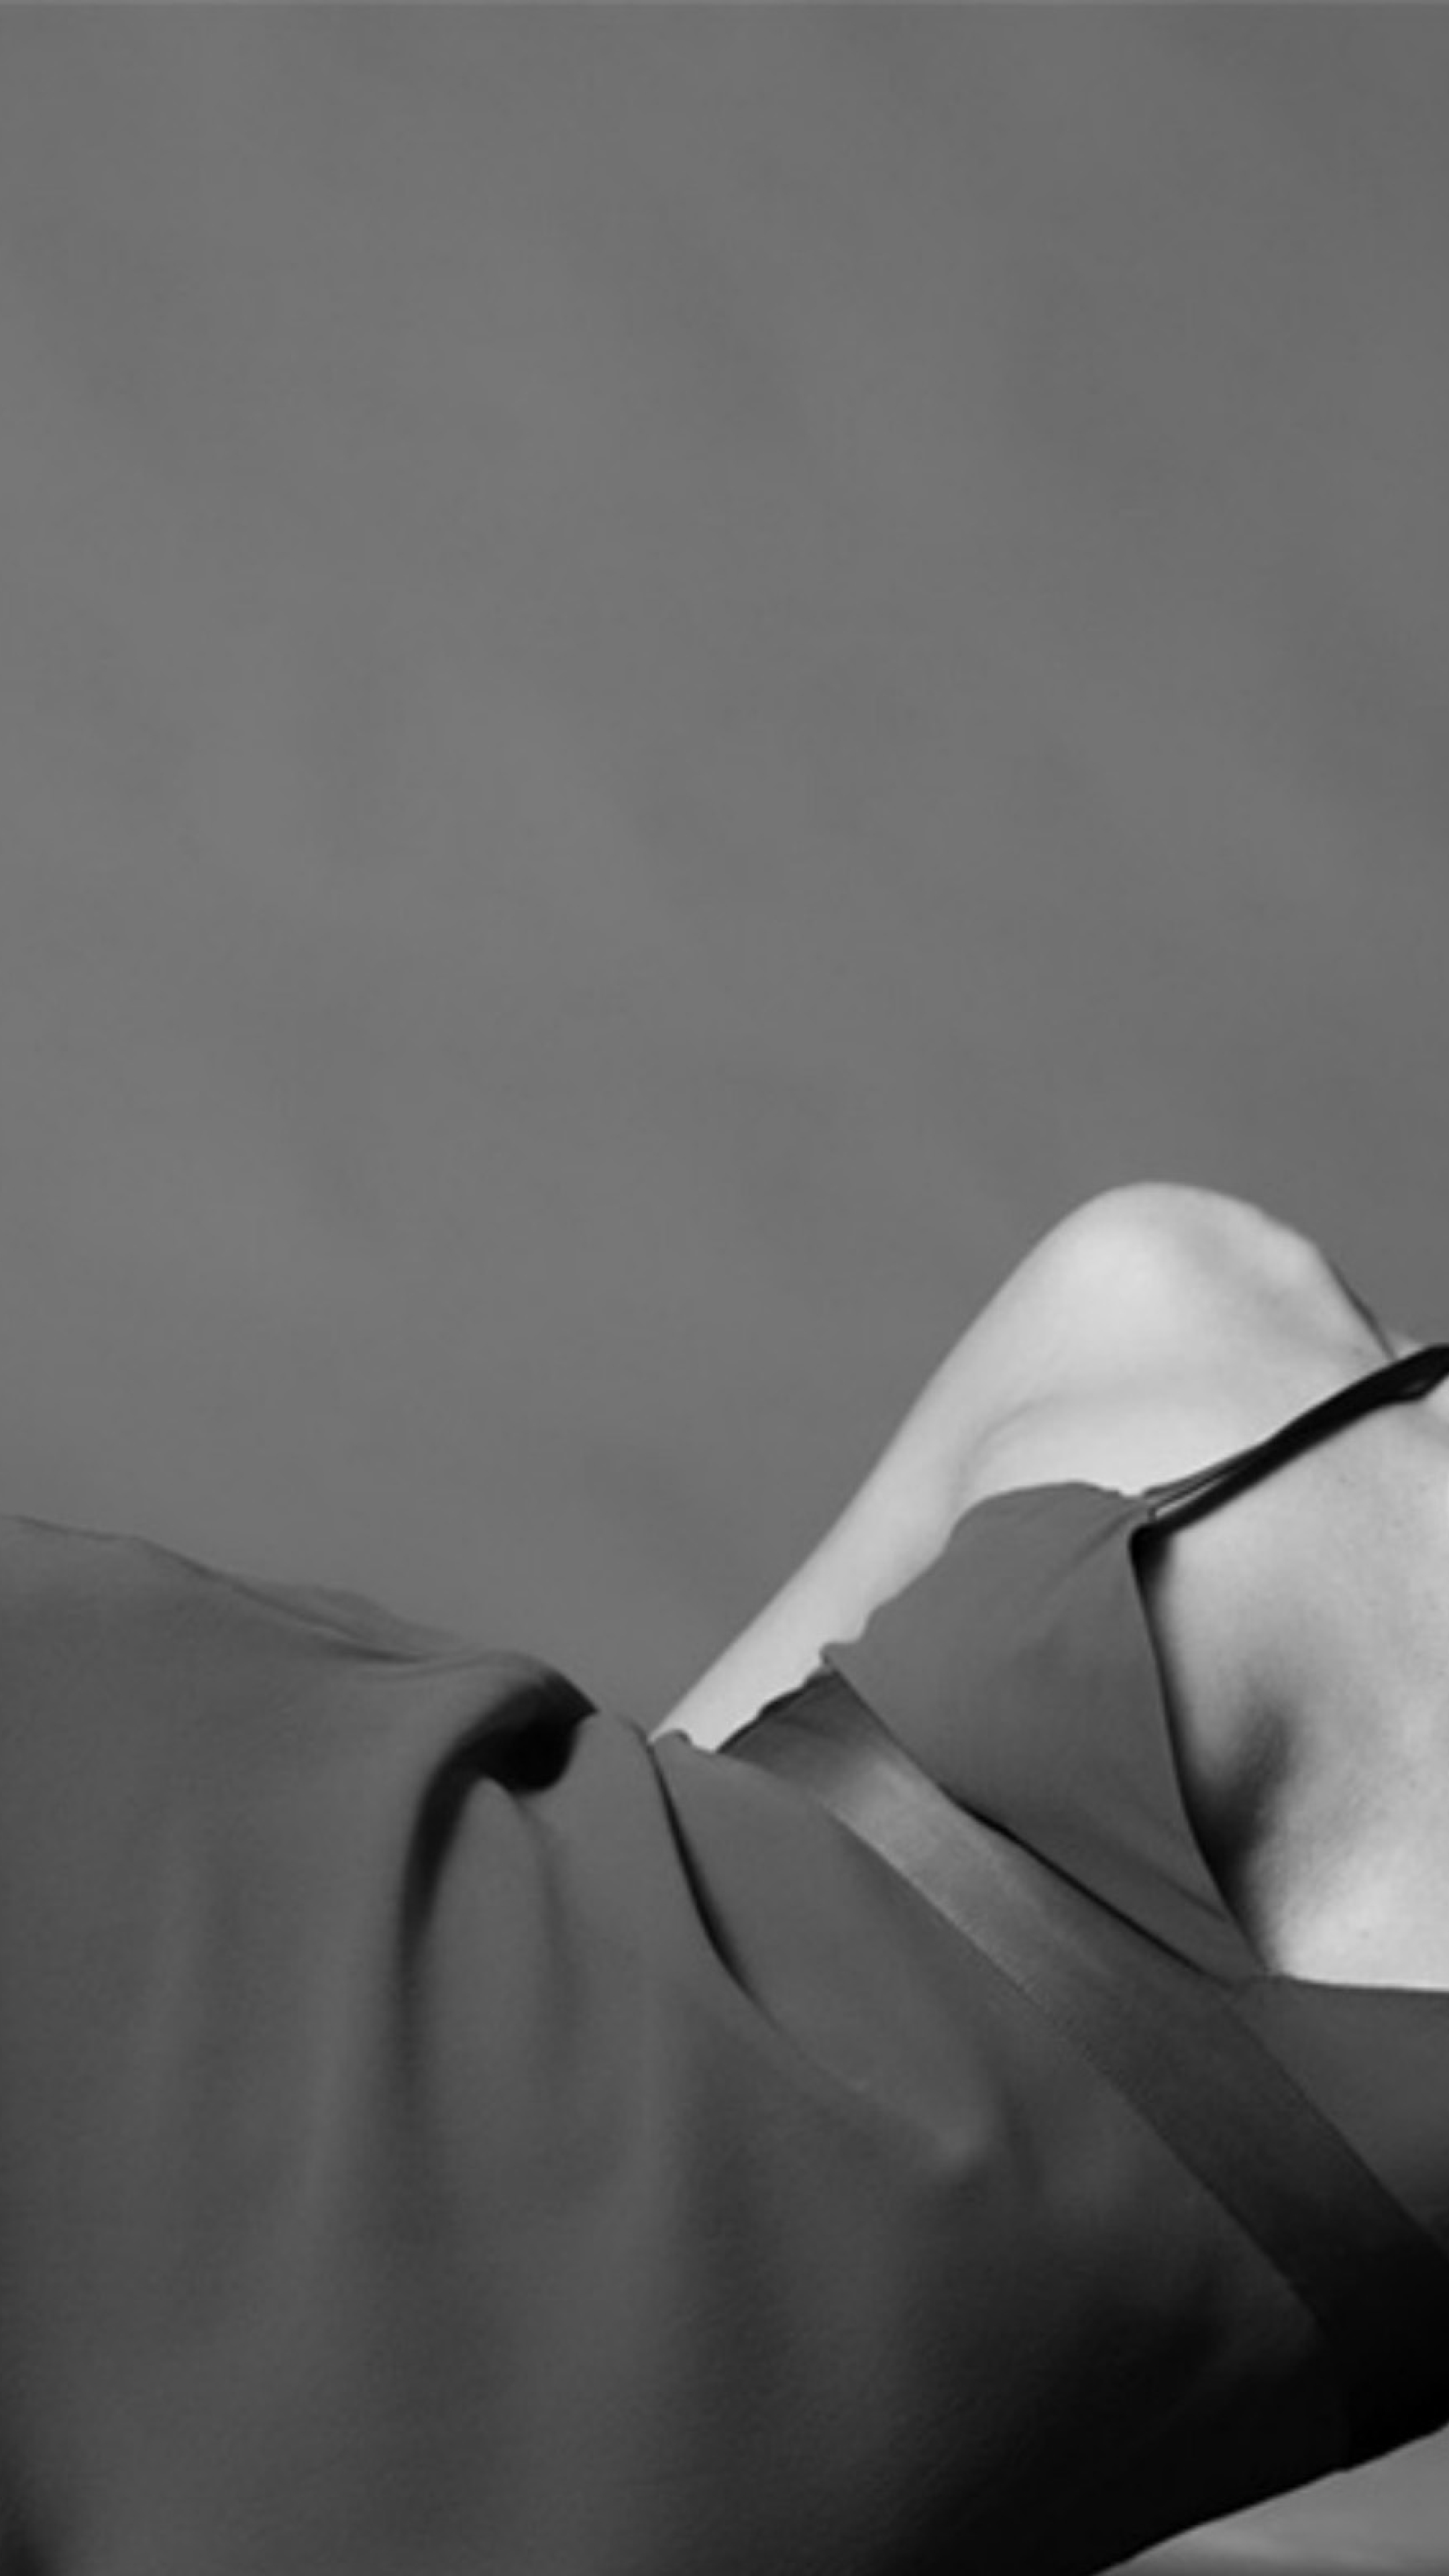 Download Megan Fox Hot Black And White Photoshoot 1024x768 ... Megan Fox Wallpaper Black And White